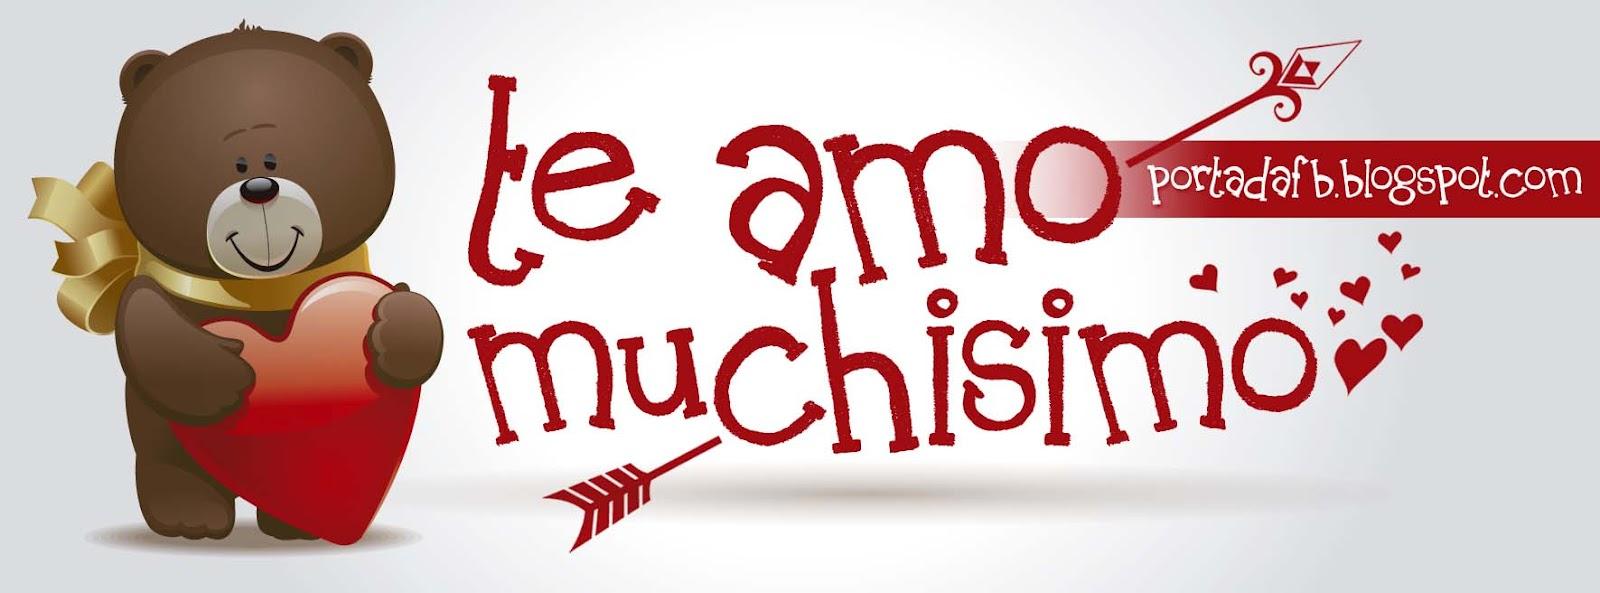 Imagenes de te amo para facebook para portada imagui for Te amo facebook